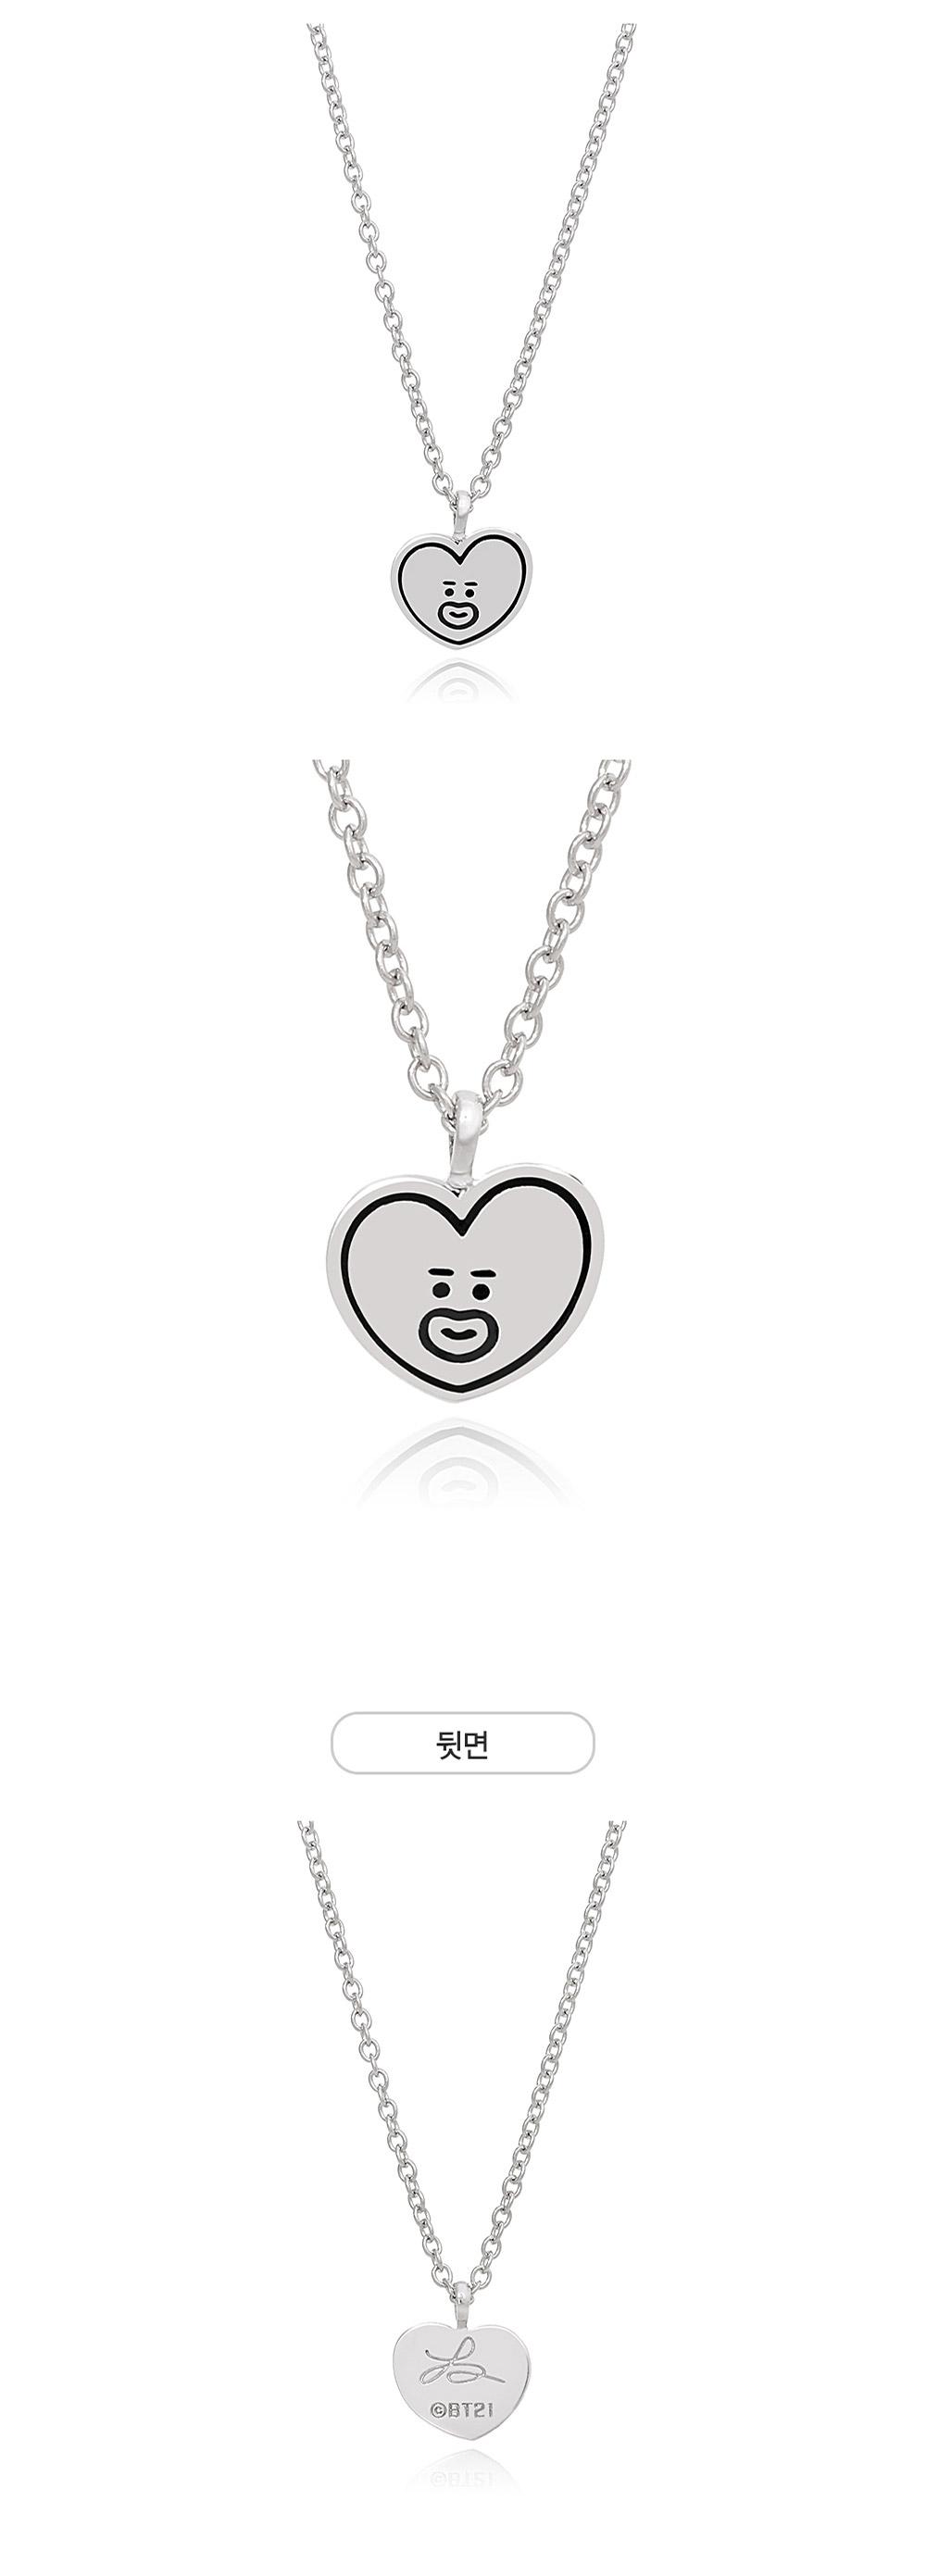 bt21_ost_necklace_04.jpg